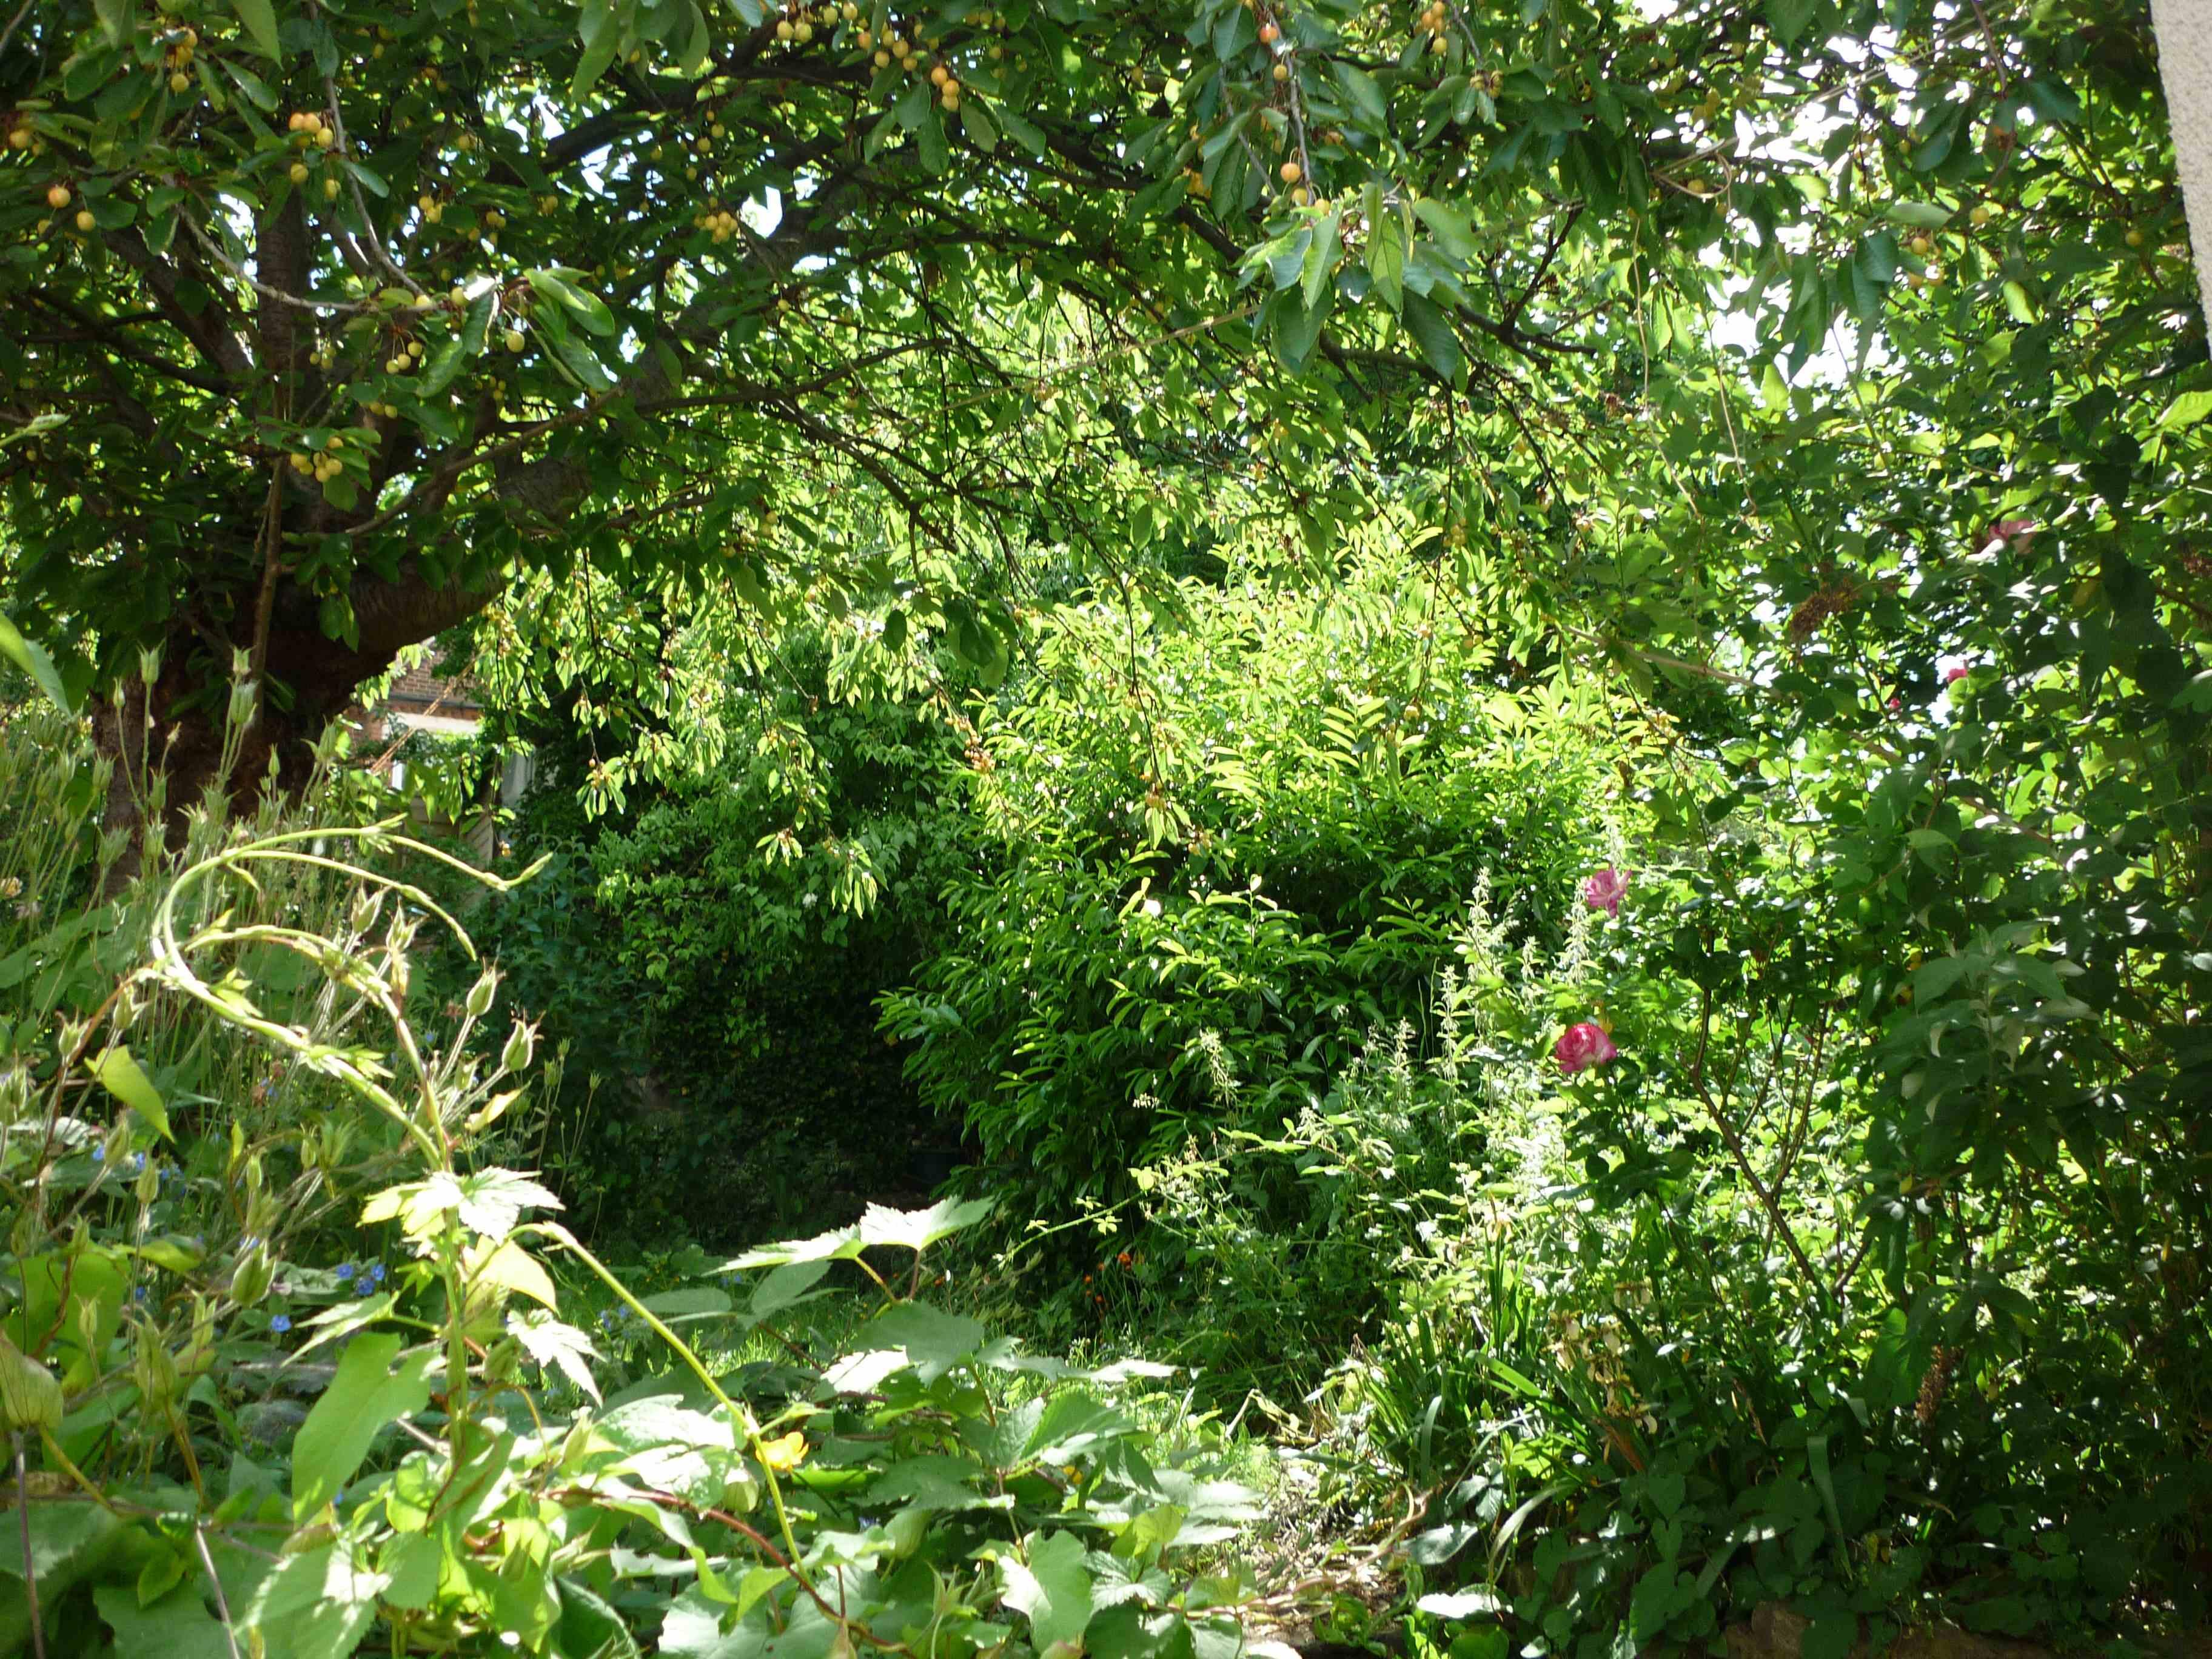 My Secret Garden: My Friend's House